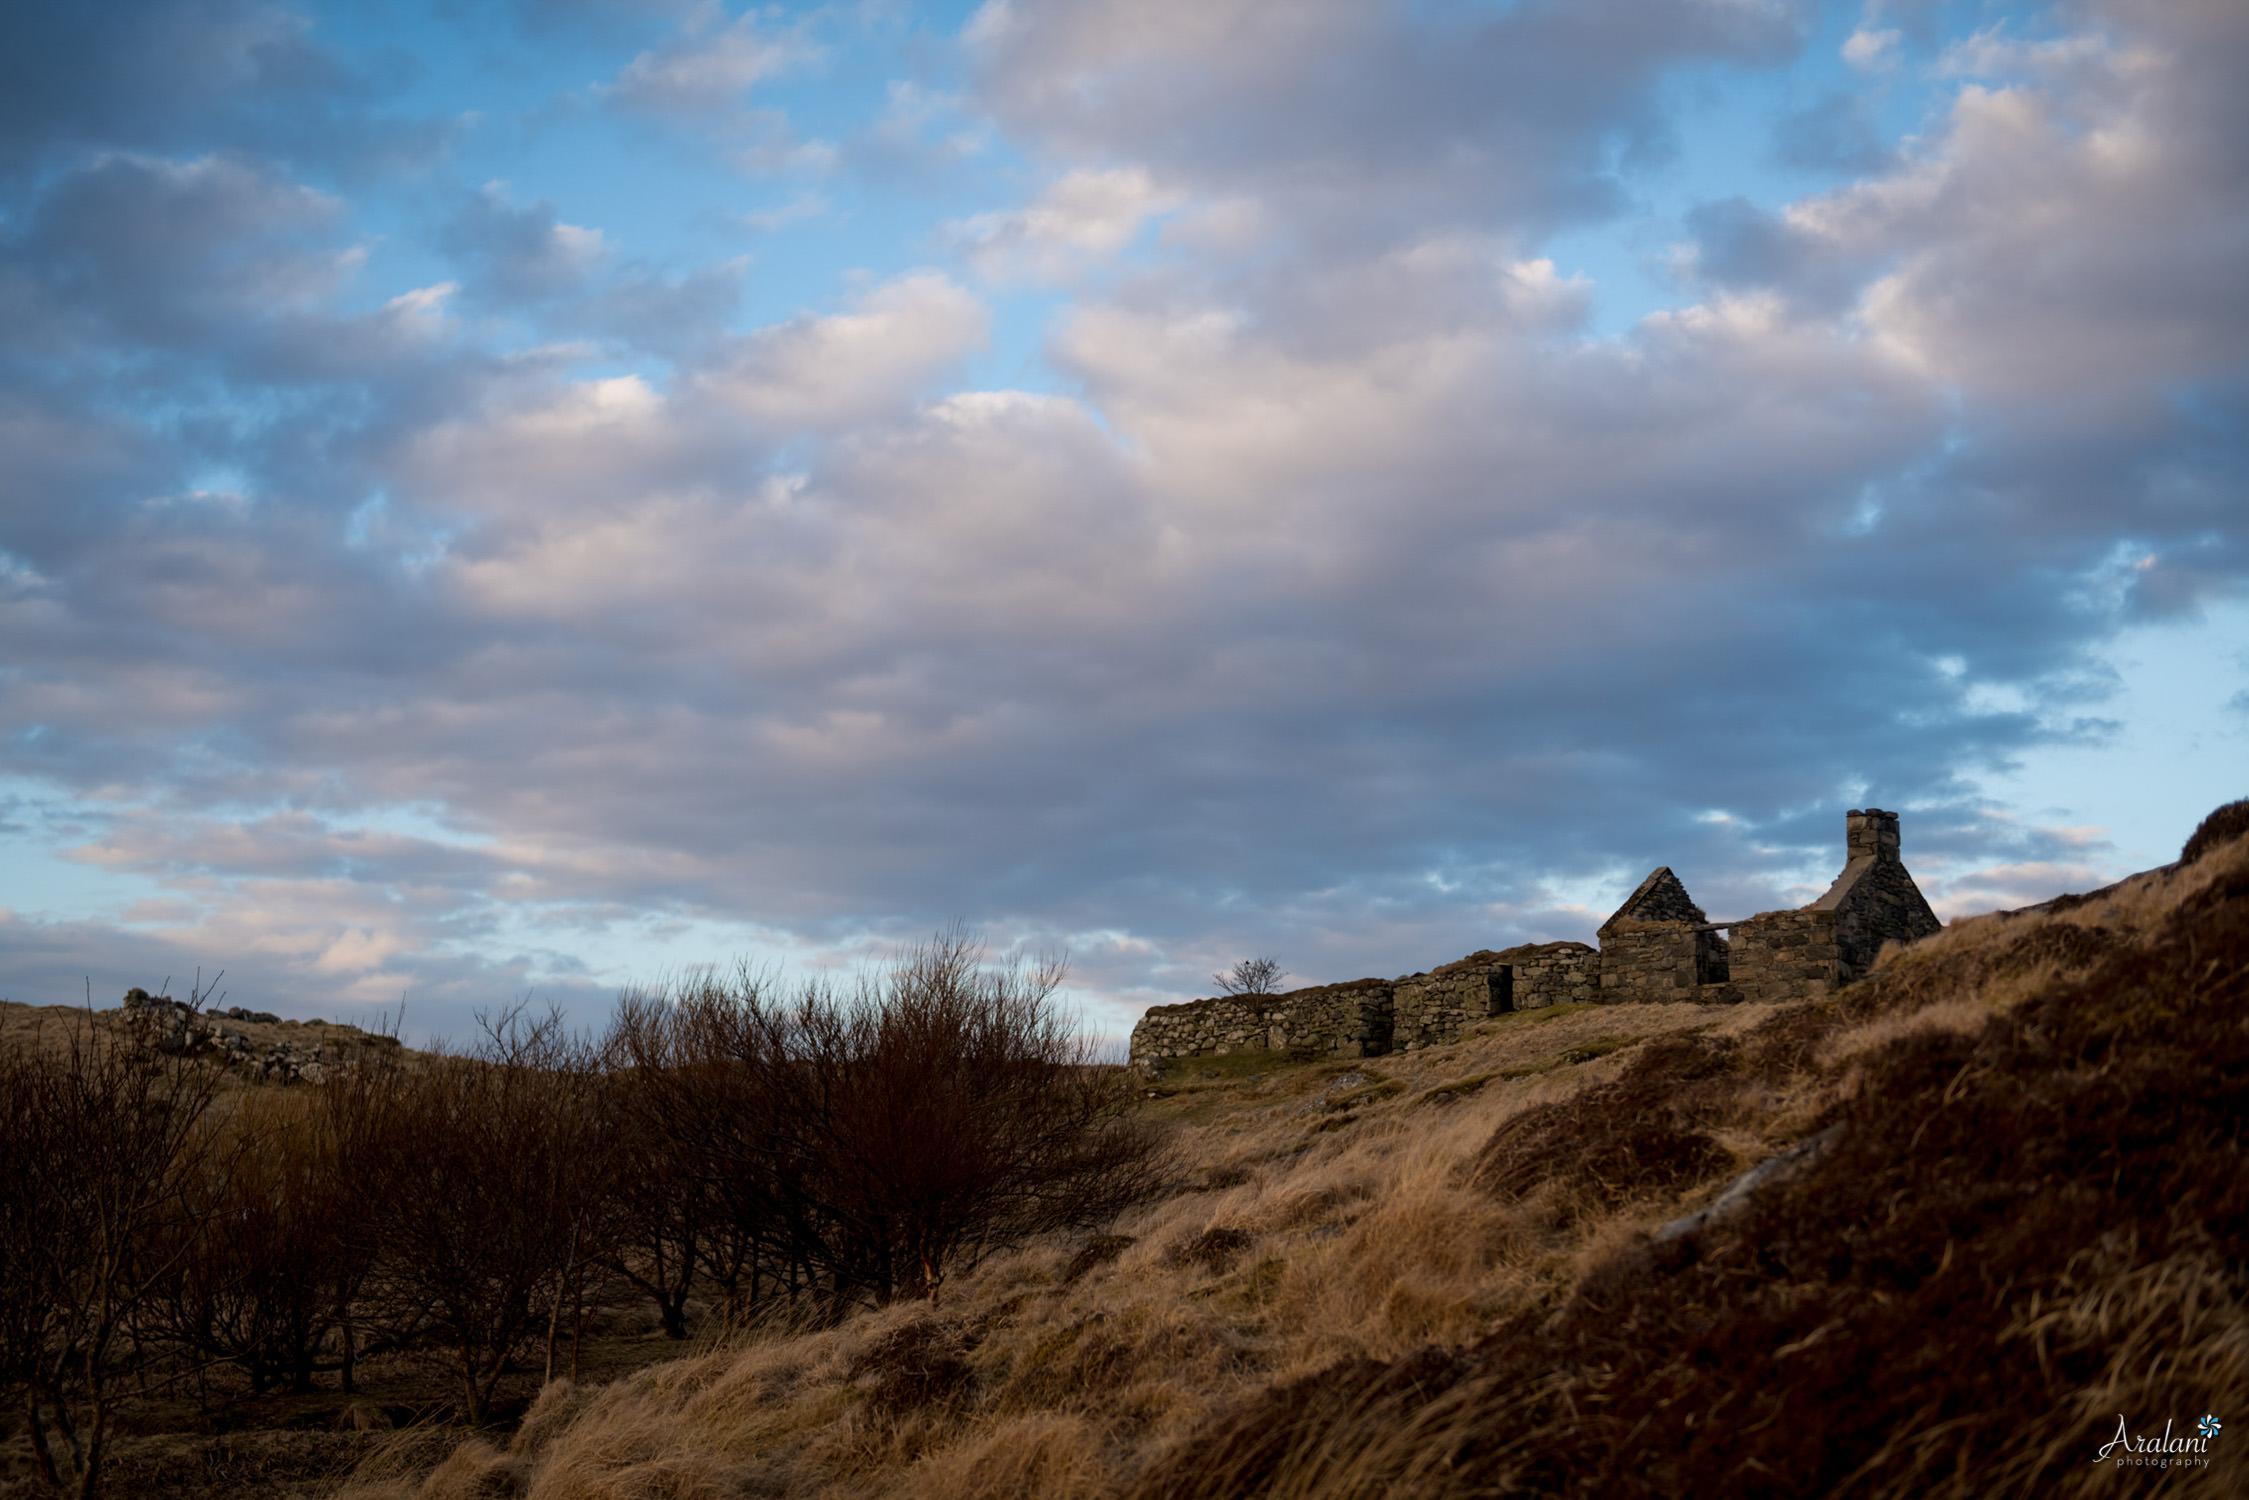 Aralani_Scotland_0049.jpg